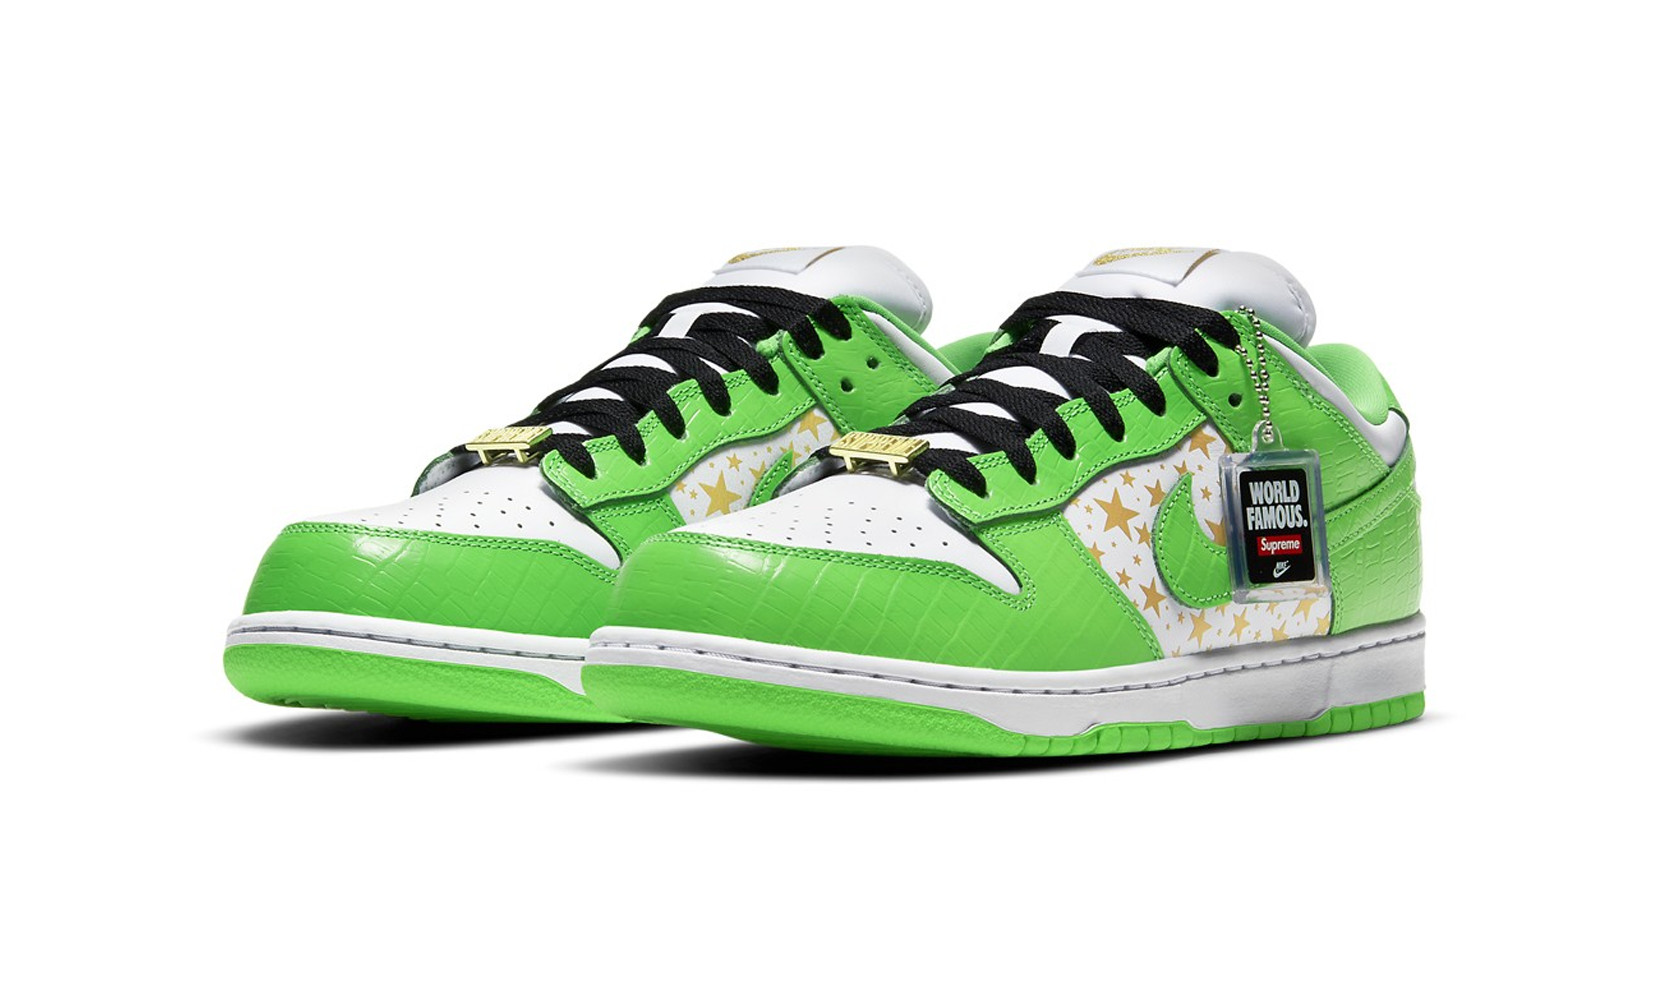 Supreme Dunk SB Dunk Low Mean Green